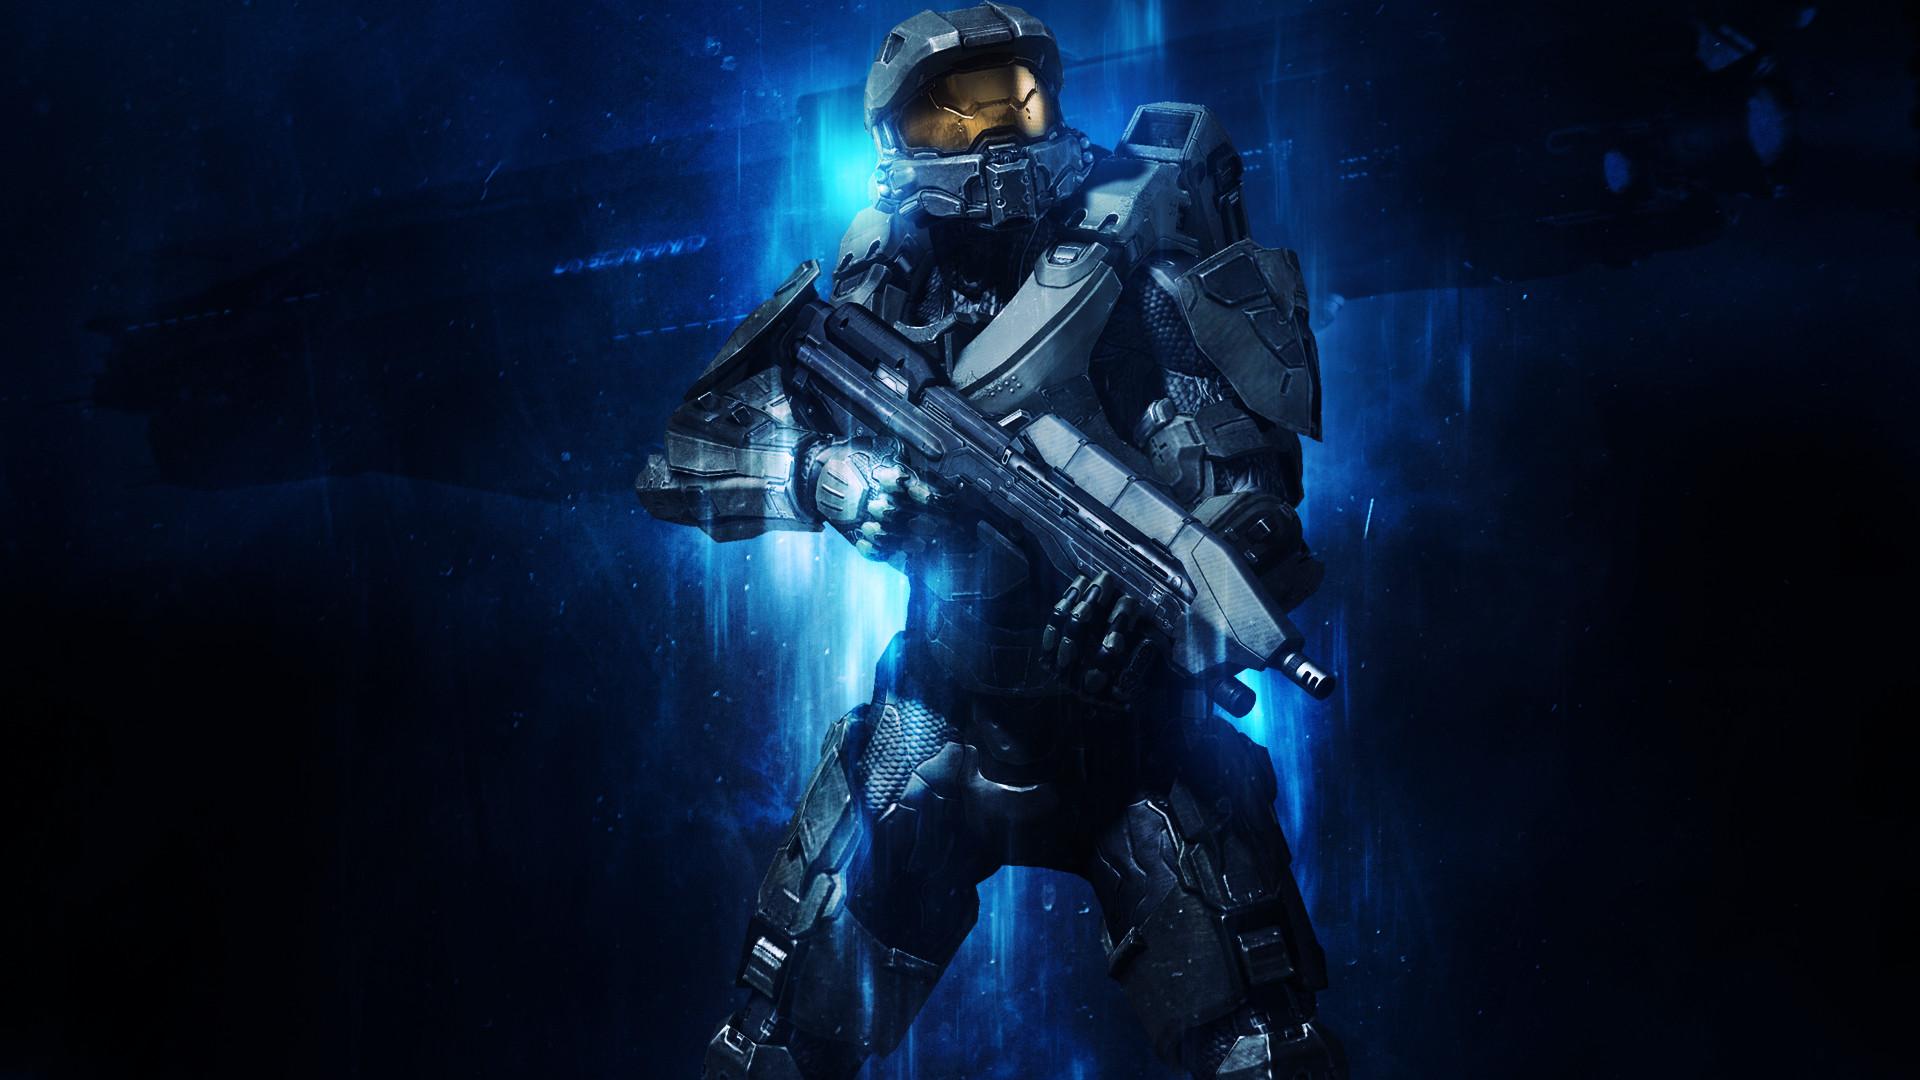 Halo 5: Guardians Computer Wallpapers, Desktop Backgrounds .